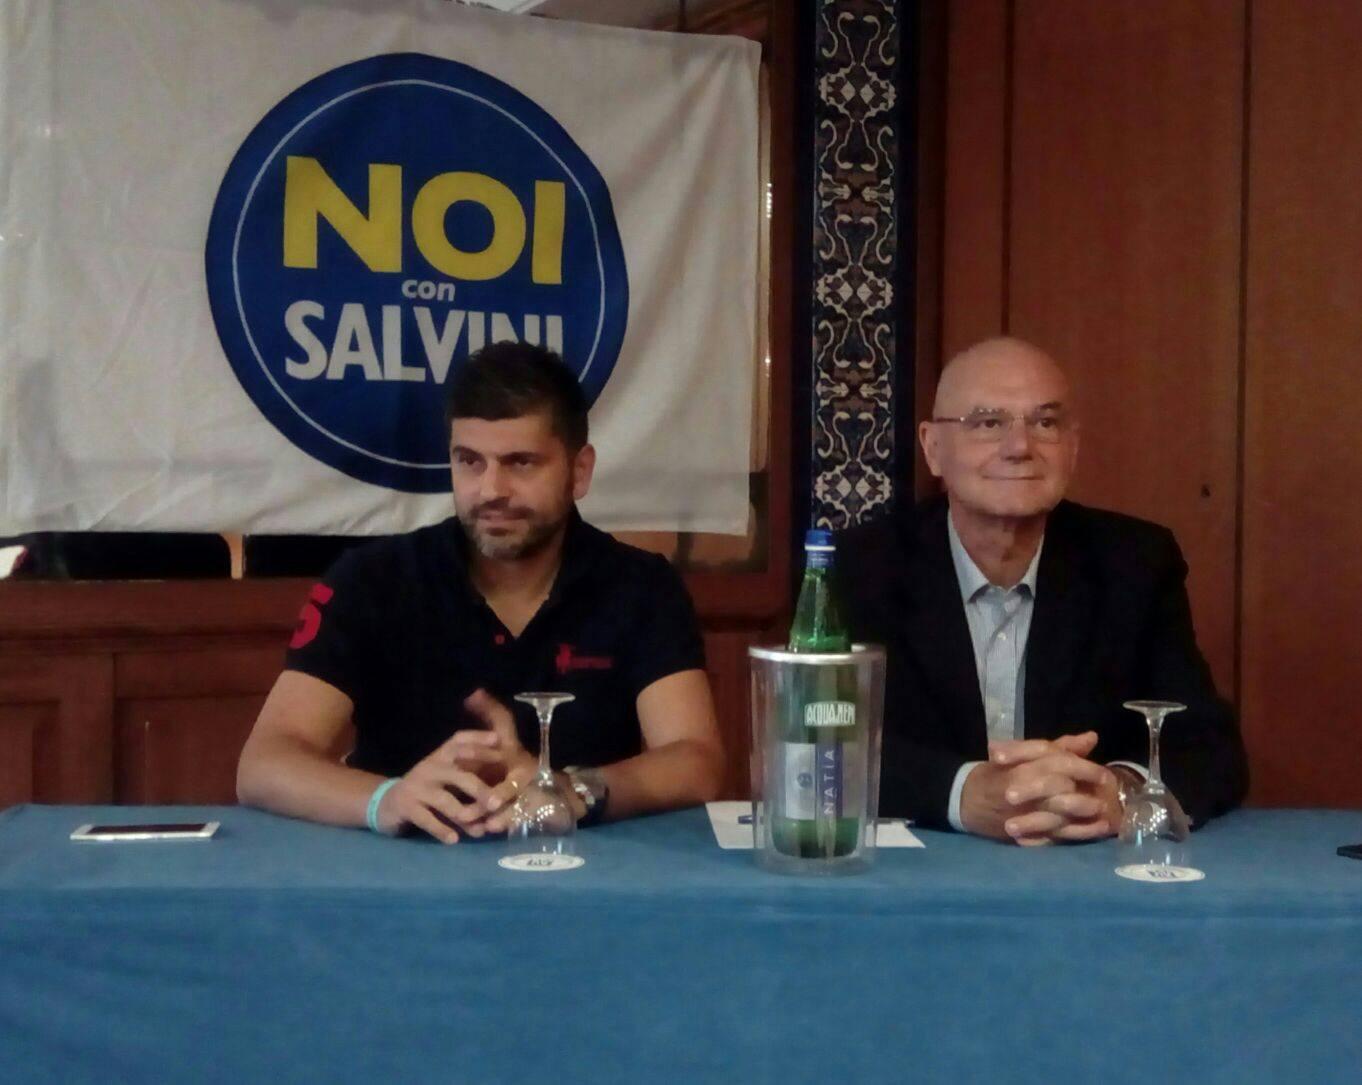 Il Dott. Massimiliano Santini nominato Coordinatore NCS a Sabaudia (LT)